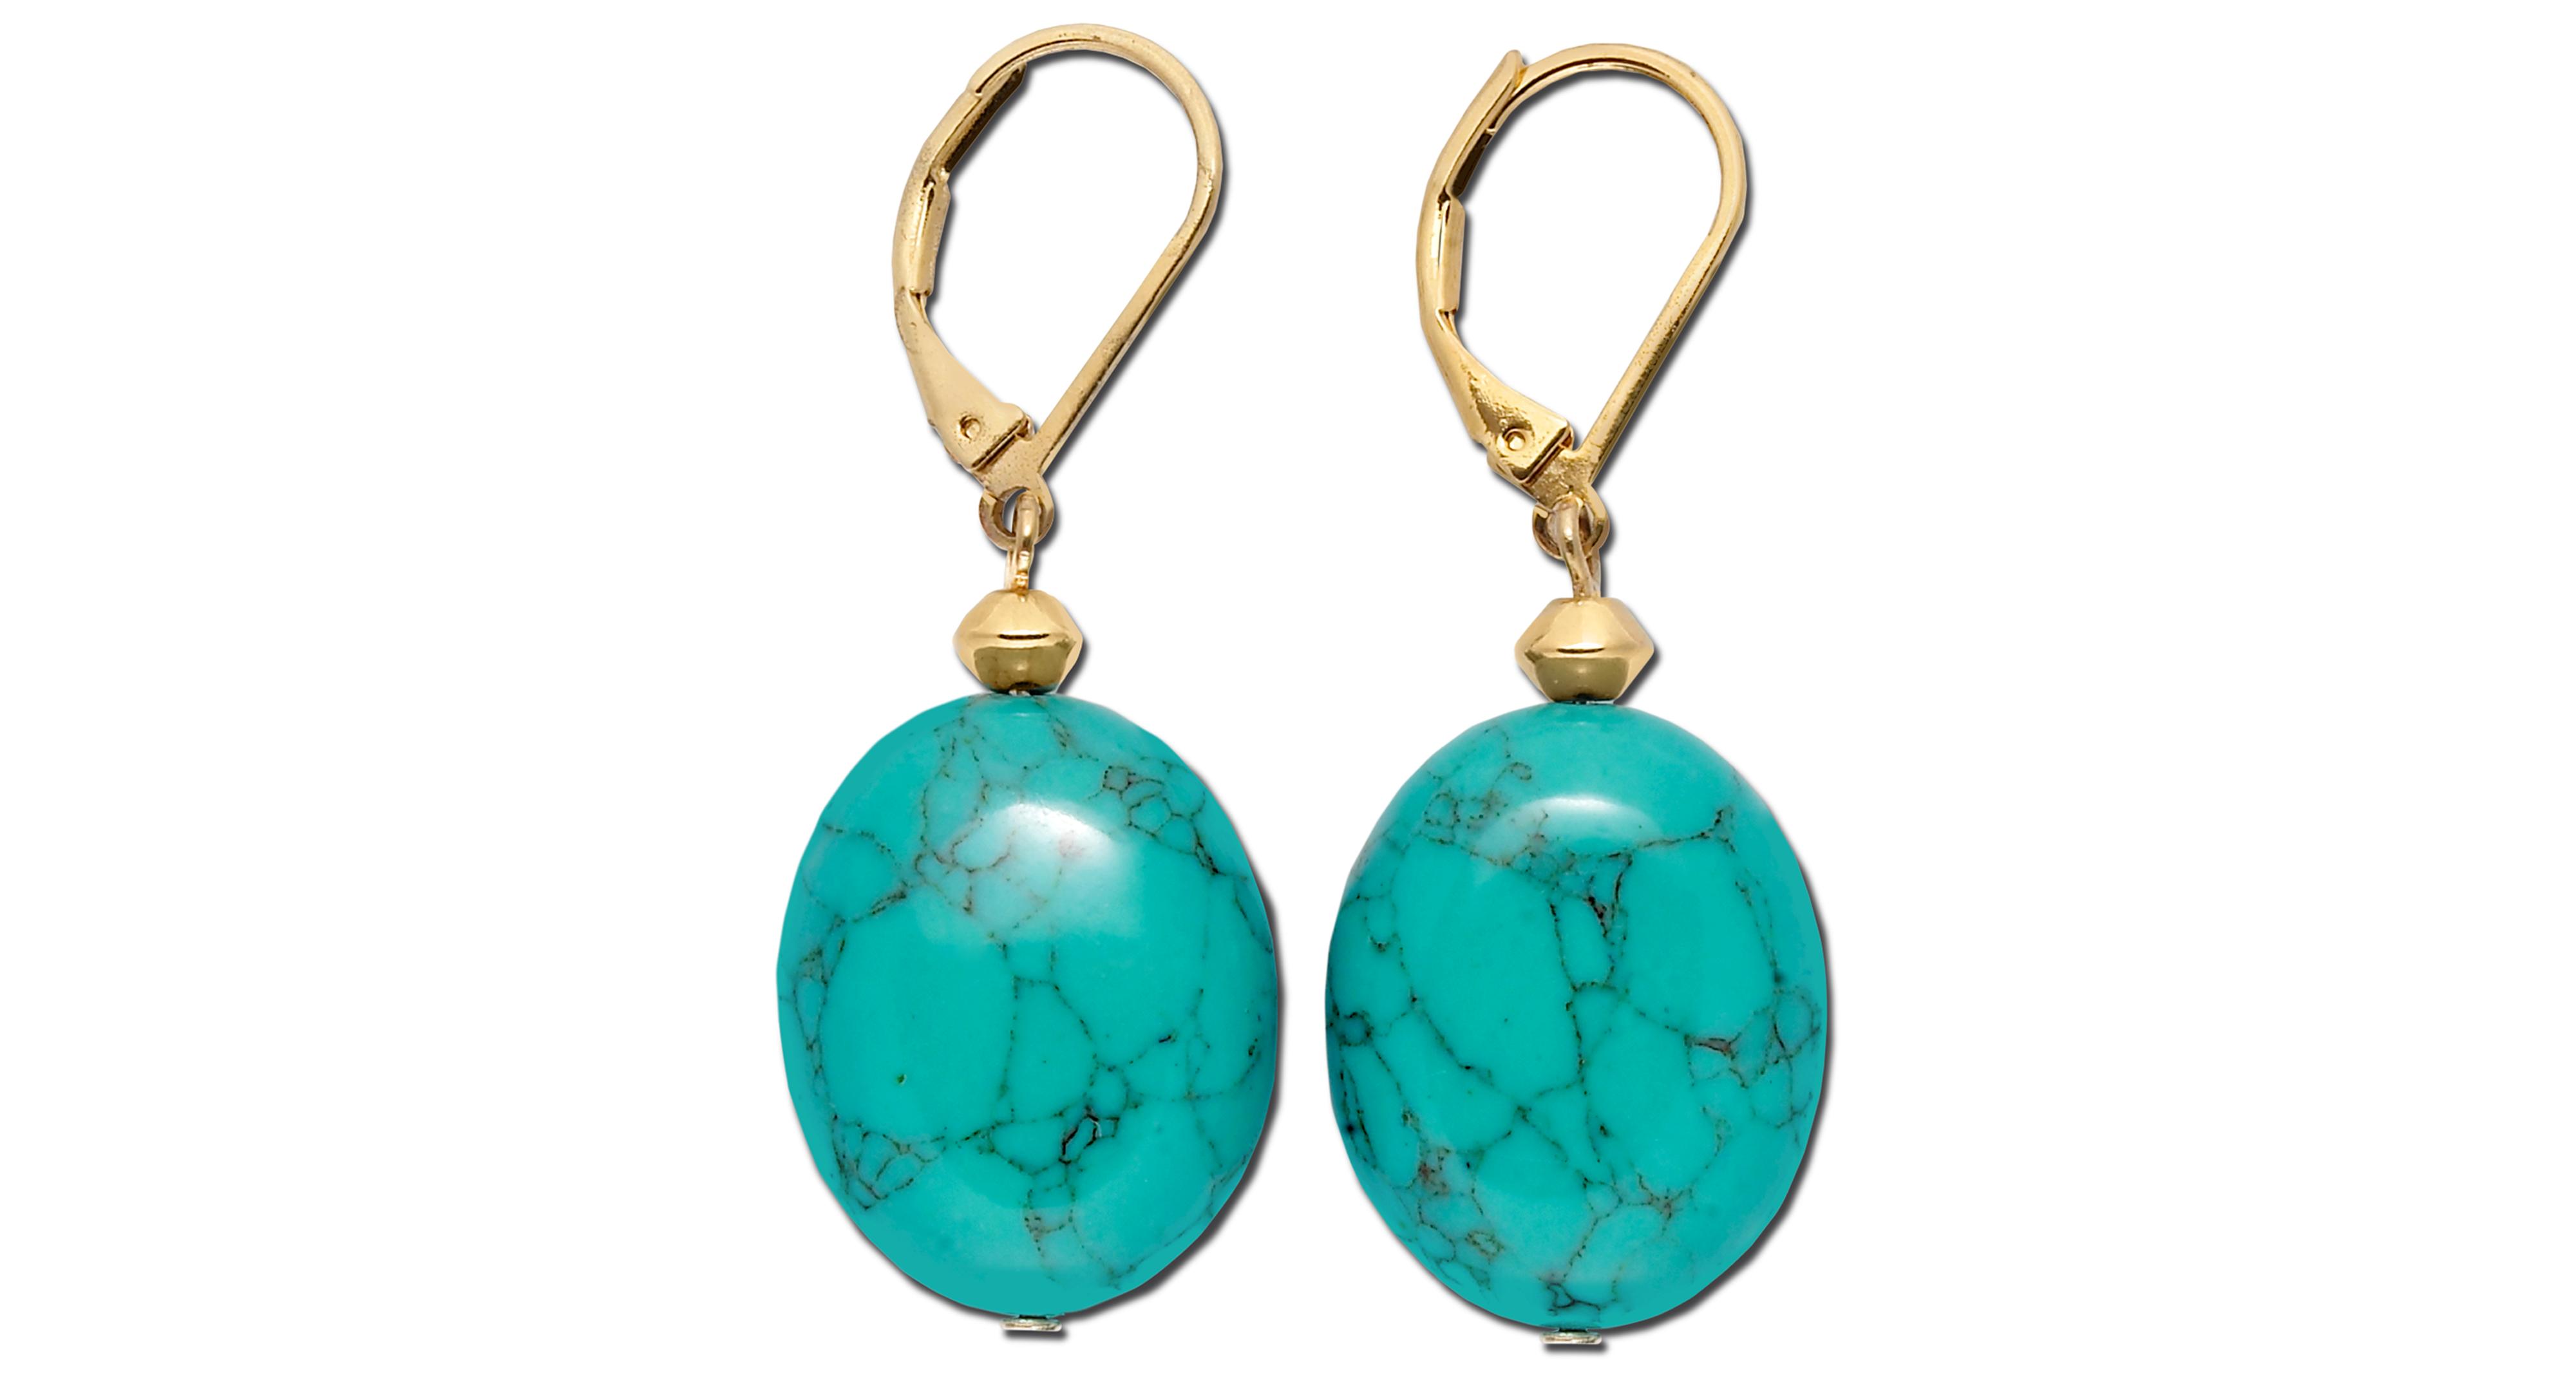 8da6c2290 Lauren Ralph Lauren Gold-Tone Stone Drop Earrings | Products ...